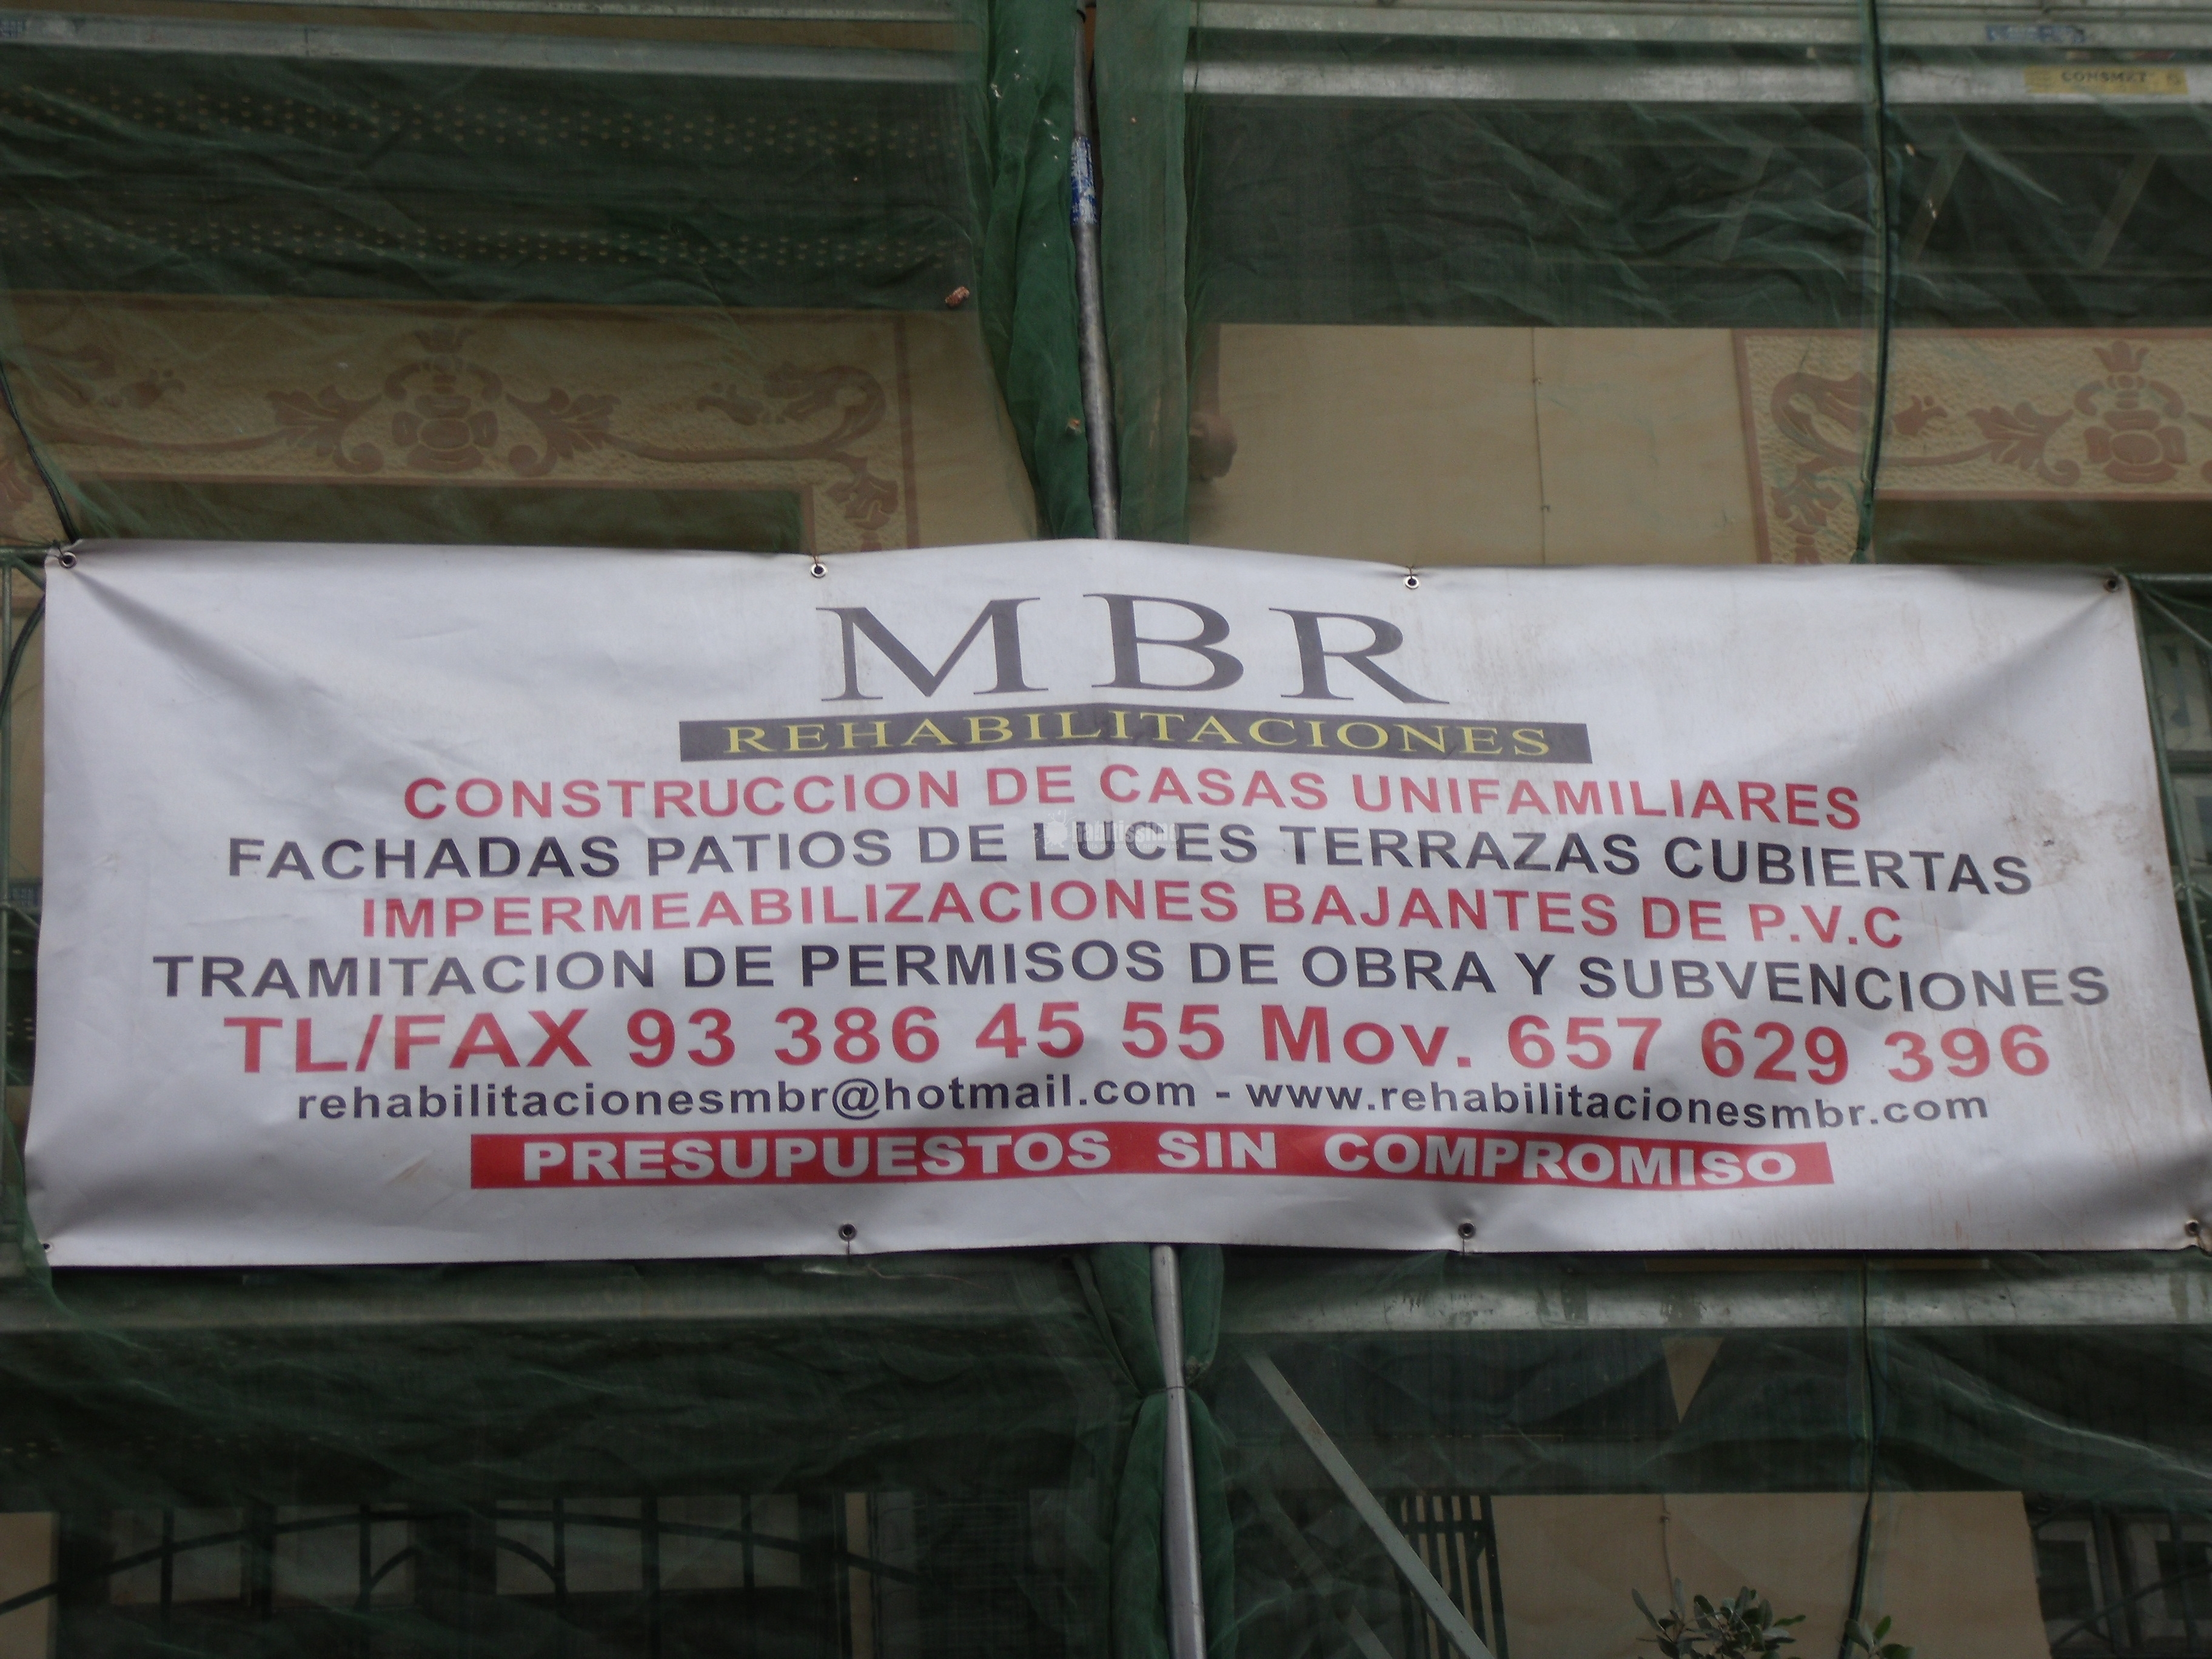 Rehabilitaciones M.B.R.